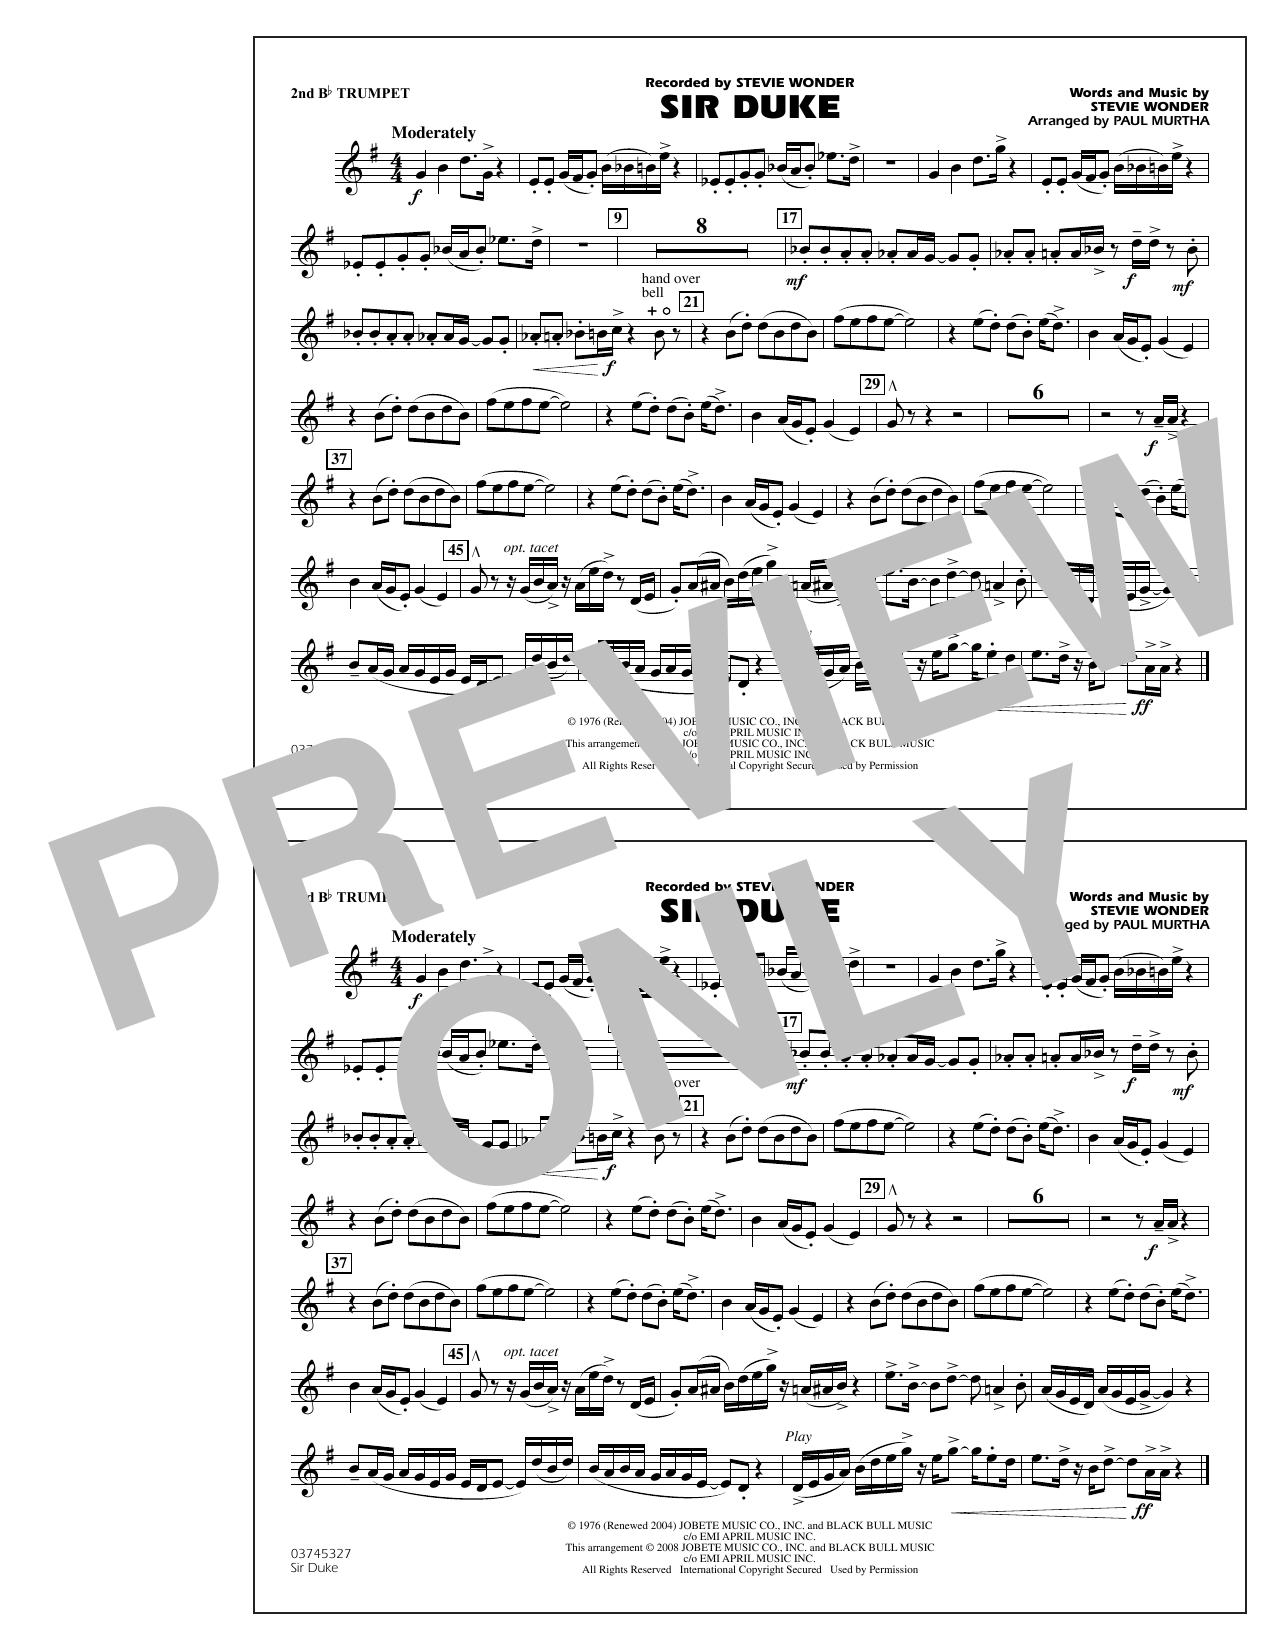 Sheet music digital files to print licensed stevie wonder sir duke 2nd bb trumpet hexwebz Choice Image